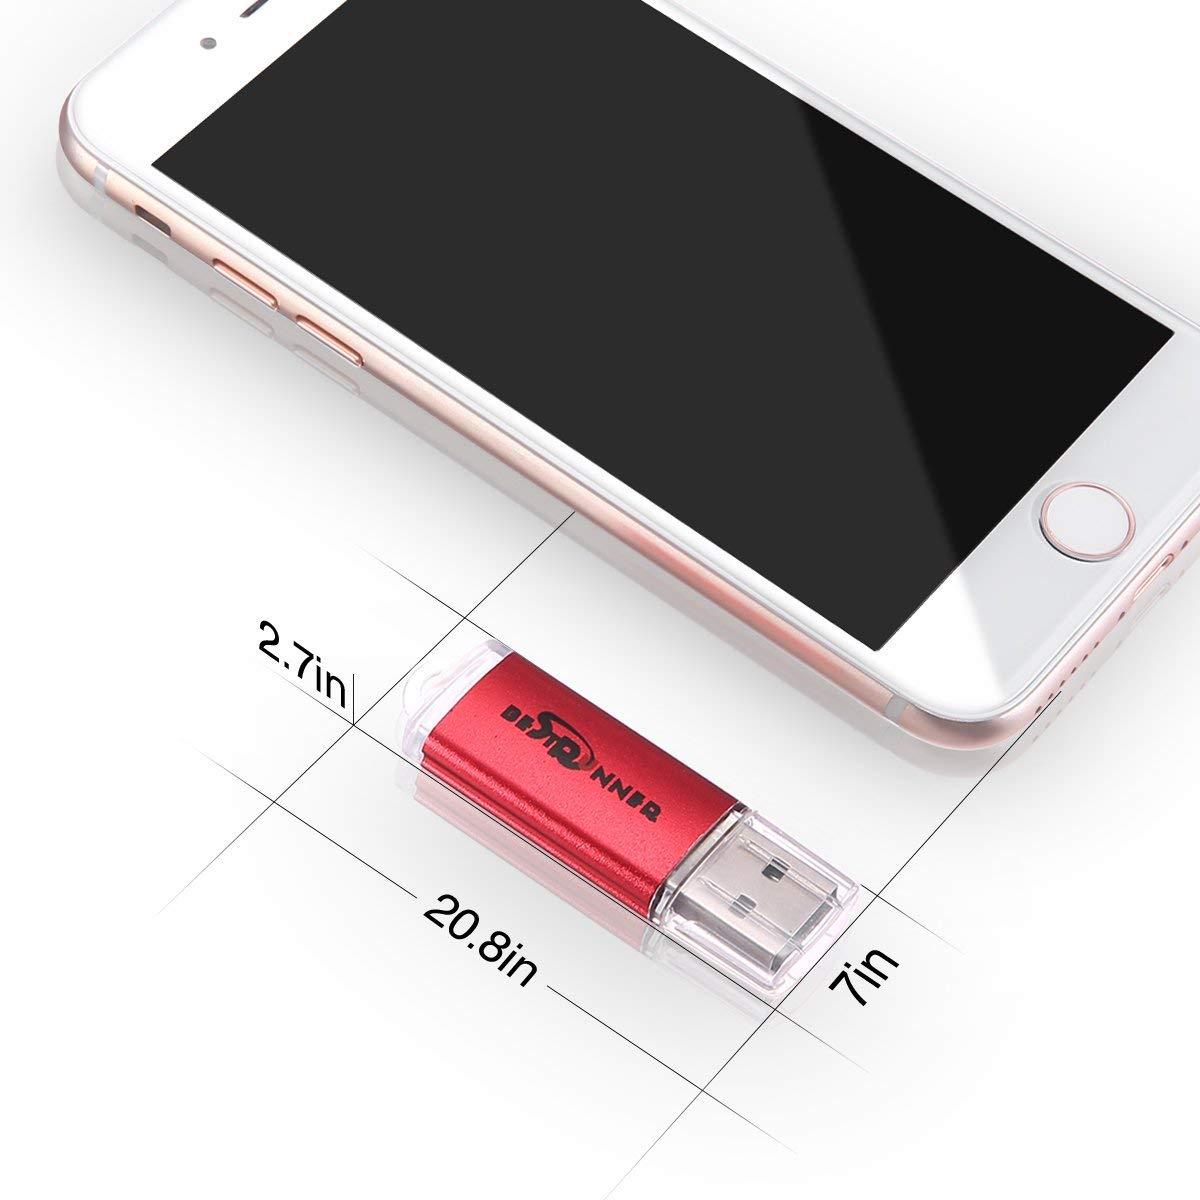 Red BestRunner 10Pcs USB Flash Drive USB 2.0 Memory Stick Pen Drive USB Storage Thumb Stick 256MB Small Capacity NOT 256GB